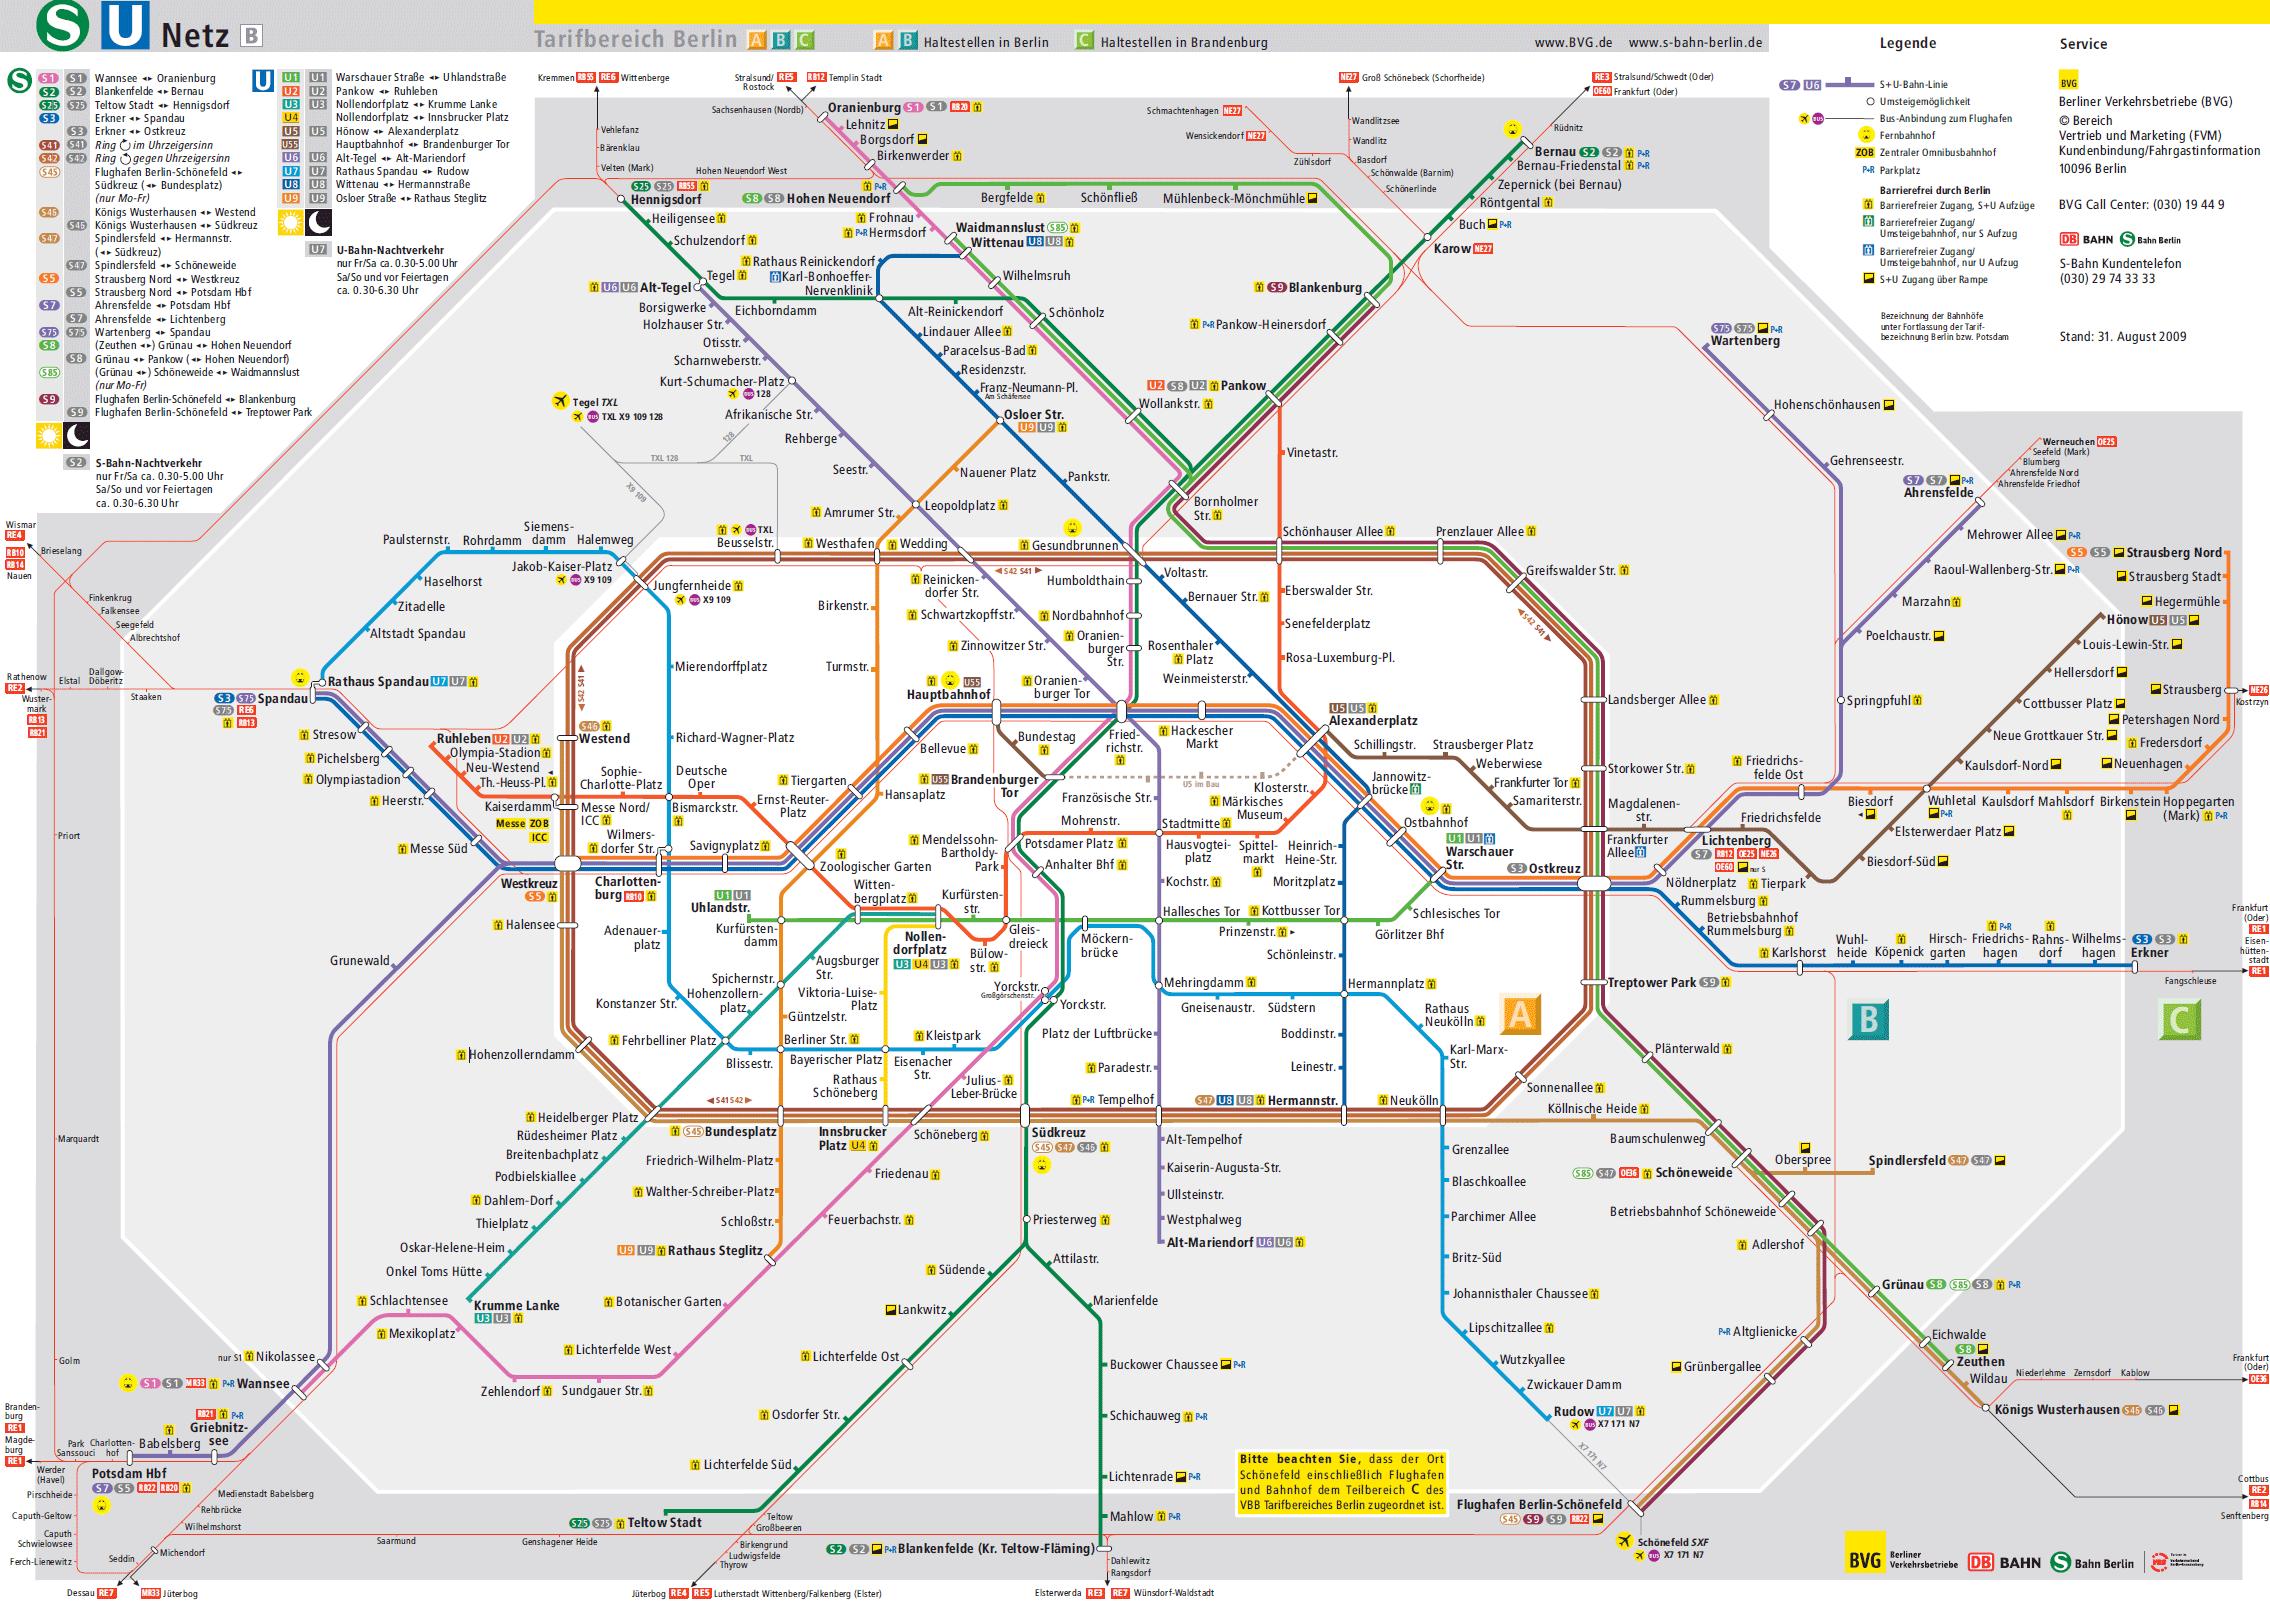 Karta Berlin Bvg.Metro V Berline Informace Jizdenky A Mapa